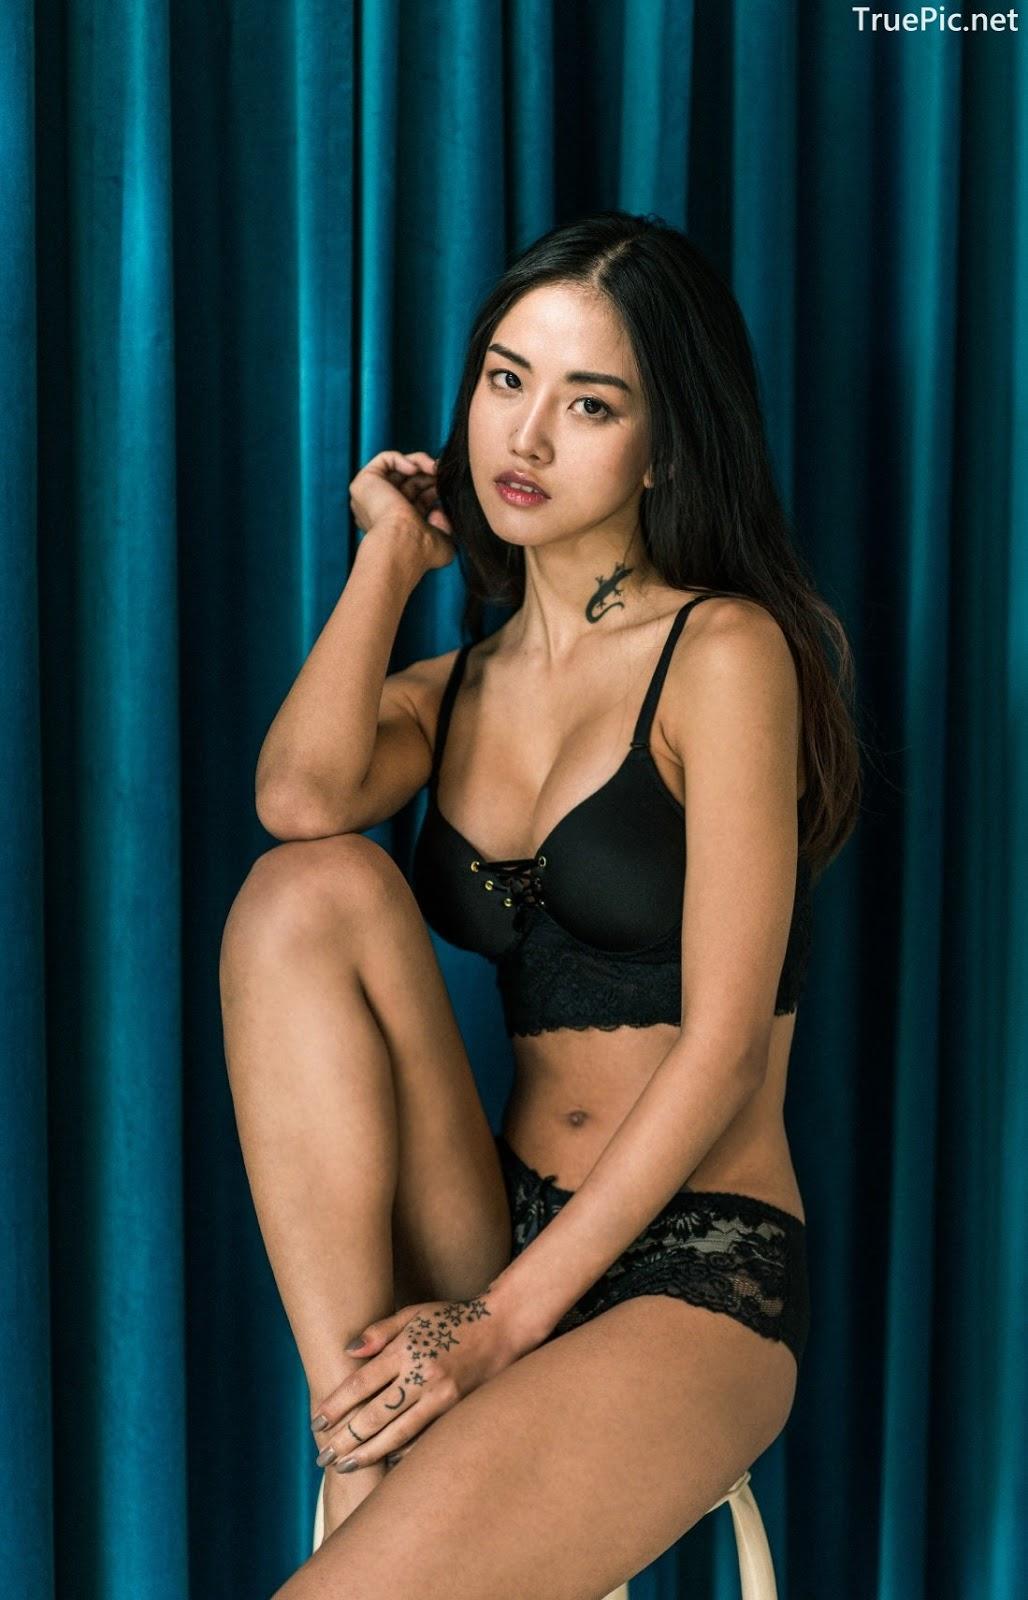 Image-Korean-Fashion-Model–Baek-Ye-Jin–Sexy-Lingerie-Collection-2-TruePic.net- Picture-3